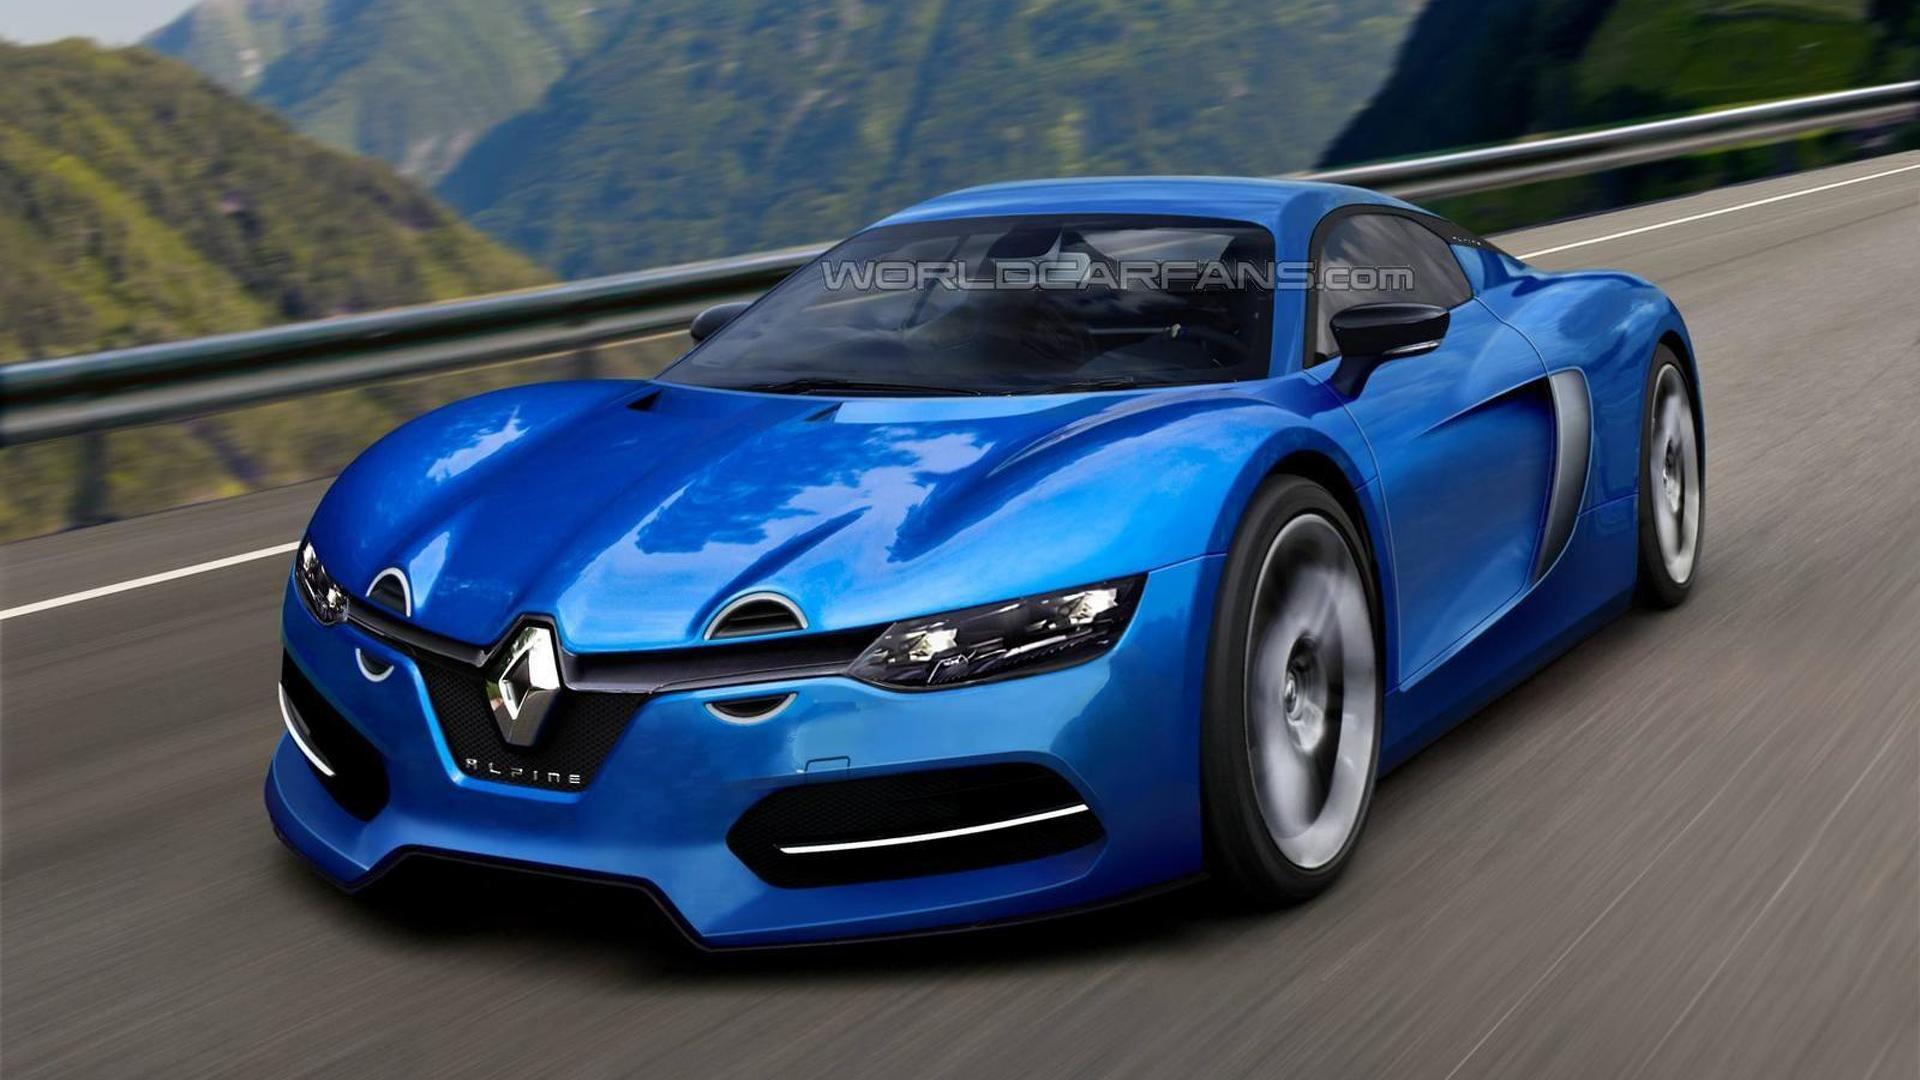 2016 Renault Alpine production version rendered